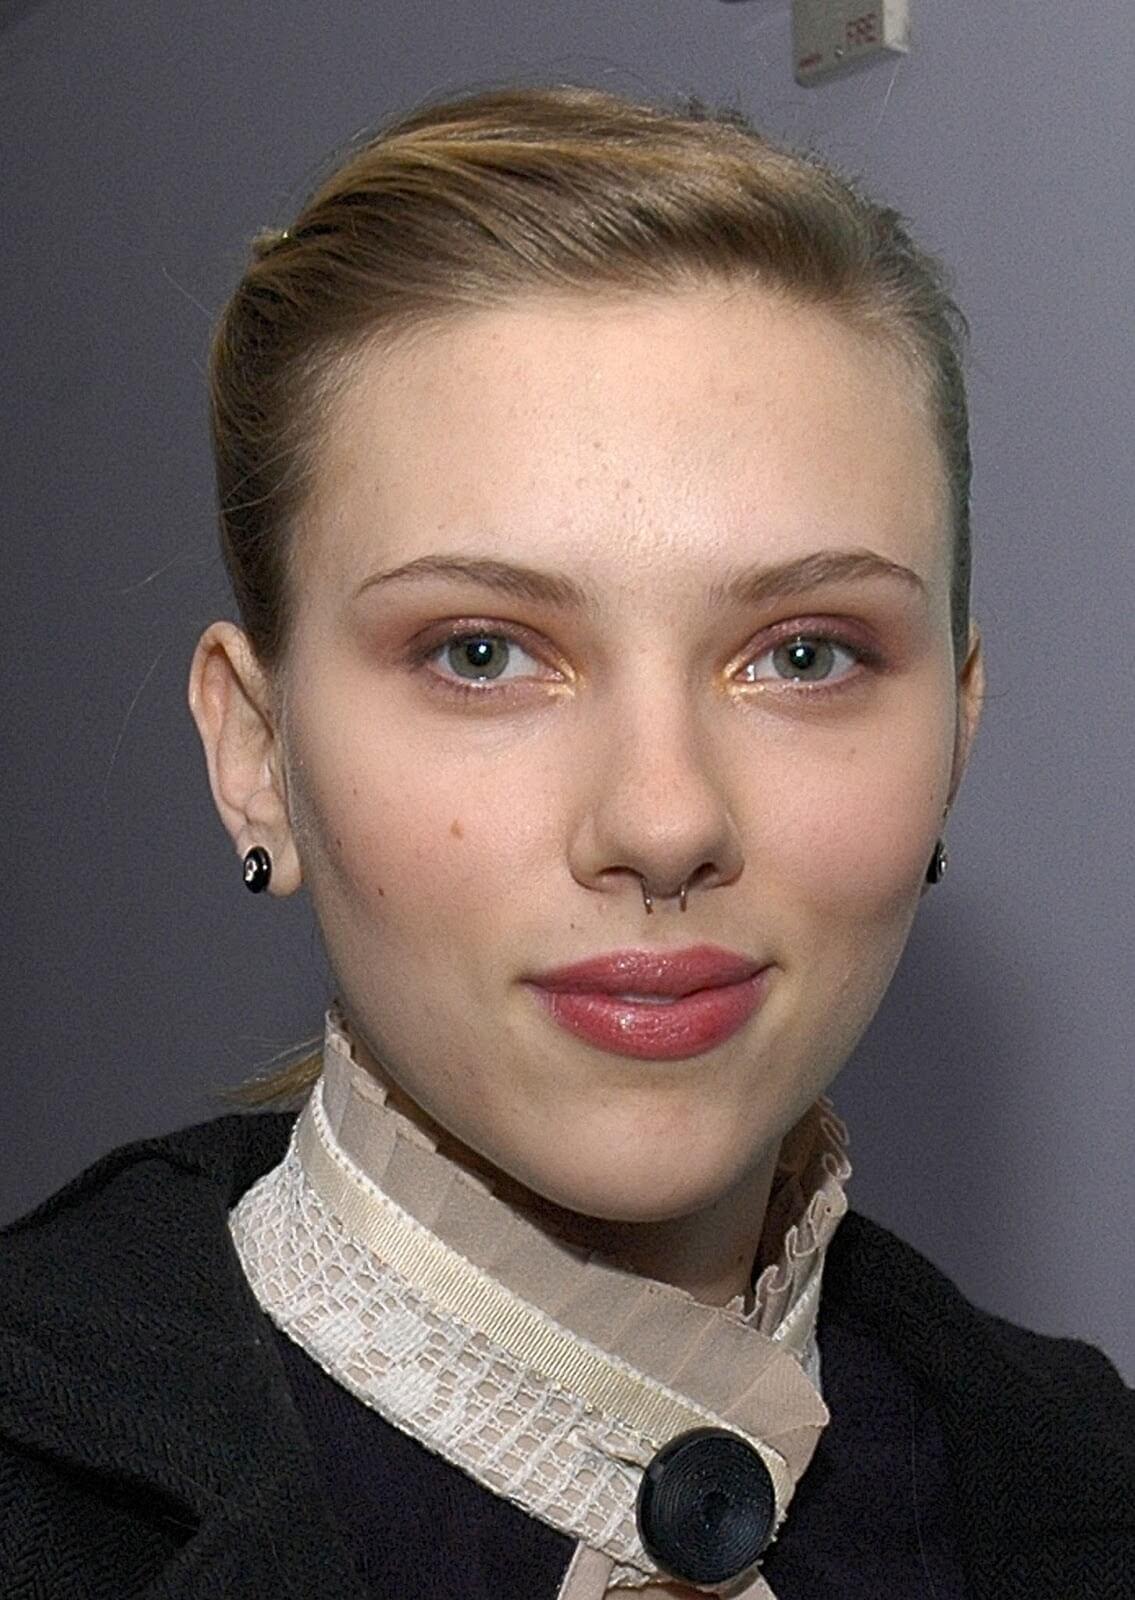 Scarlett Johansson con un septum falso en la nariz.